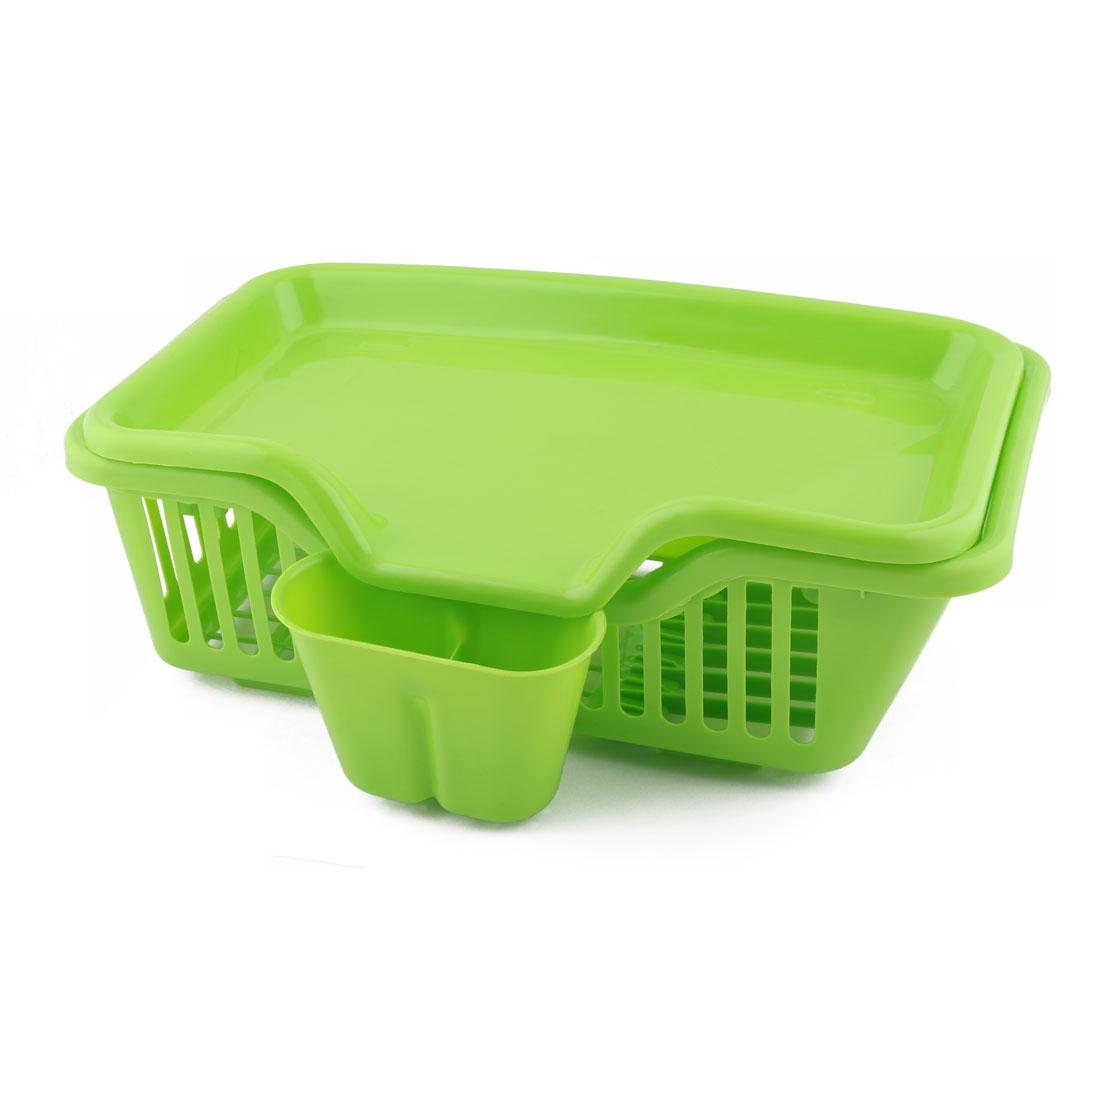 Plastic Hollow Out Design Bowl Salver Organizer Storage Plate Rack Set Green